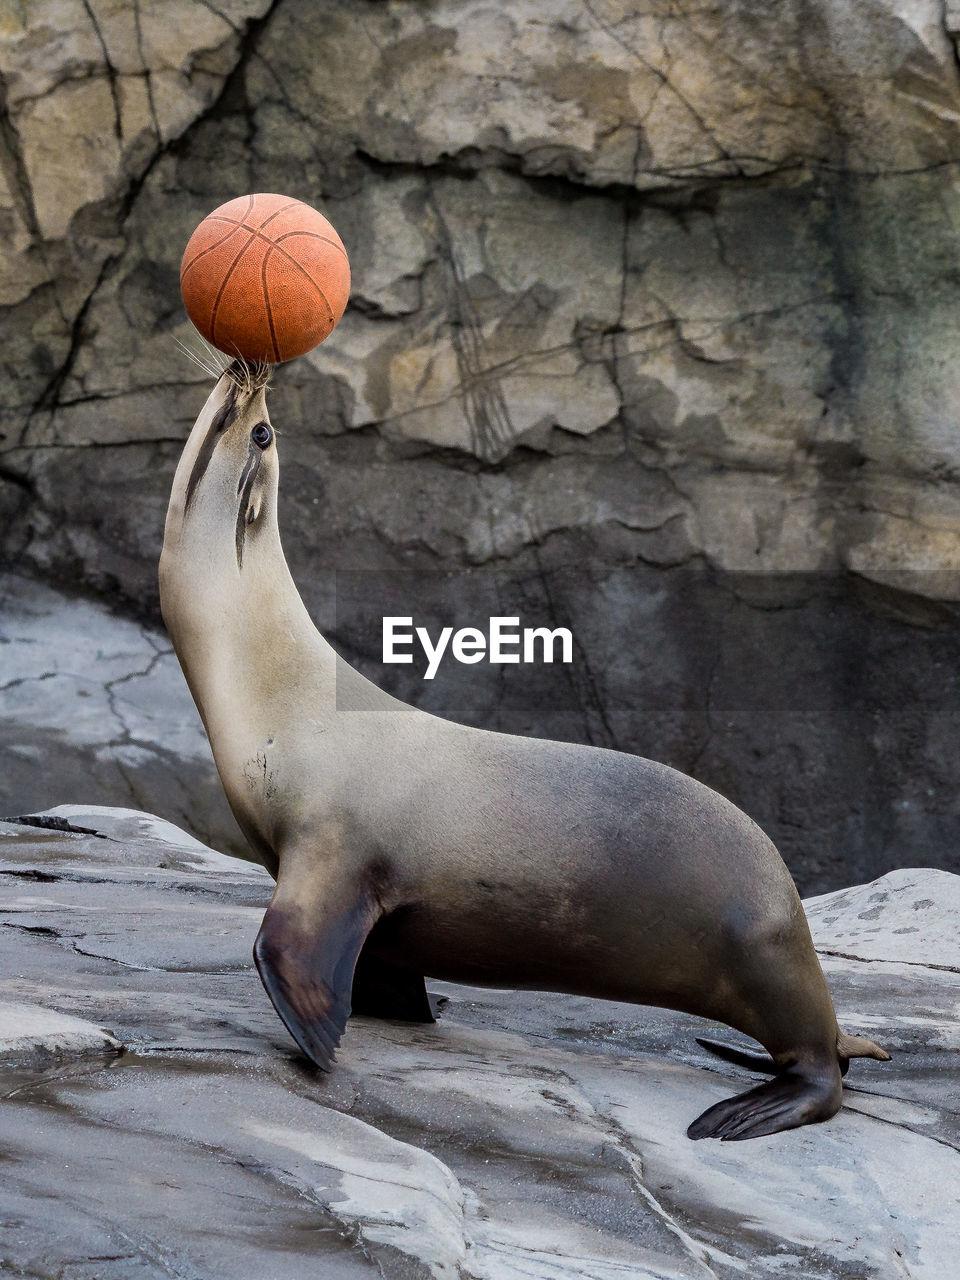 Side View Of Sea Lion Balancing Basketball At Zoo